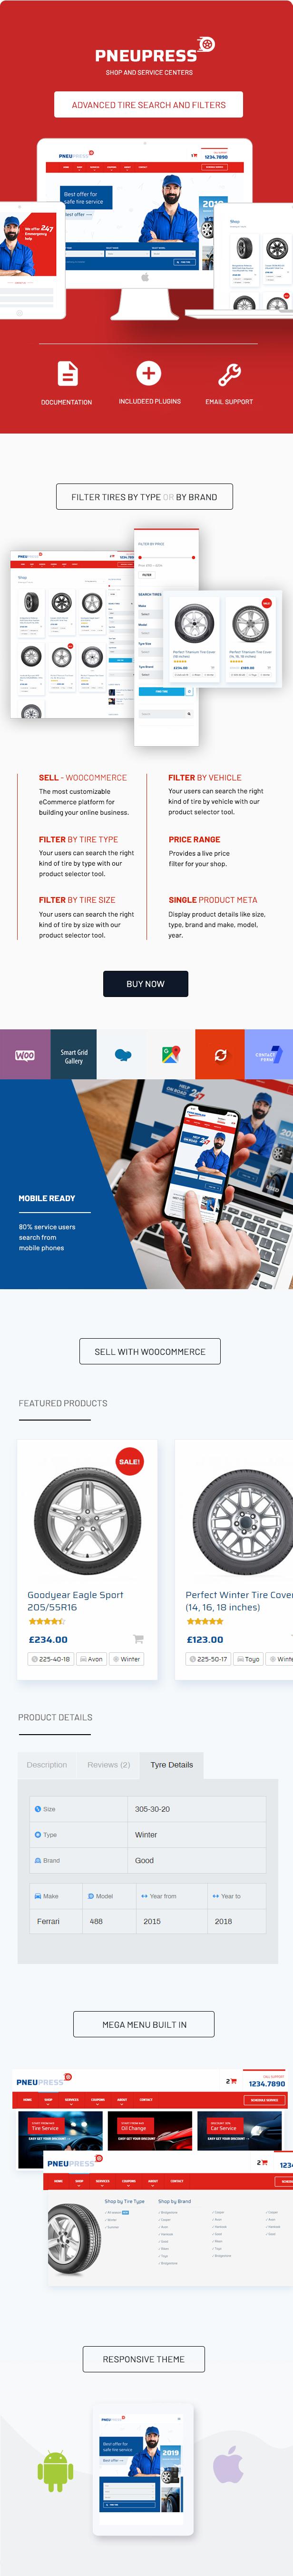 PneuPress - Tire Shop and Car Repair WordPress Theme - 2